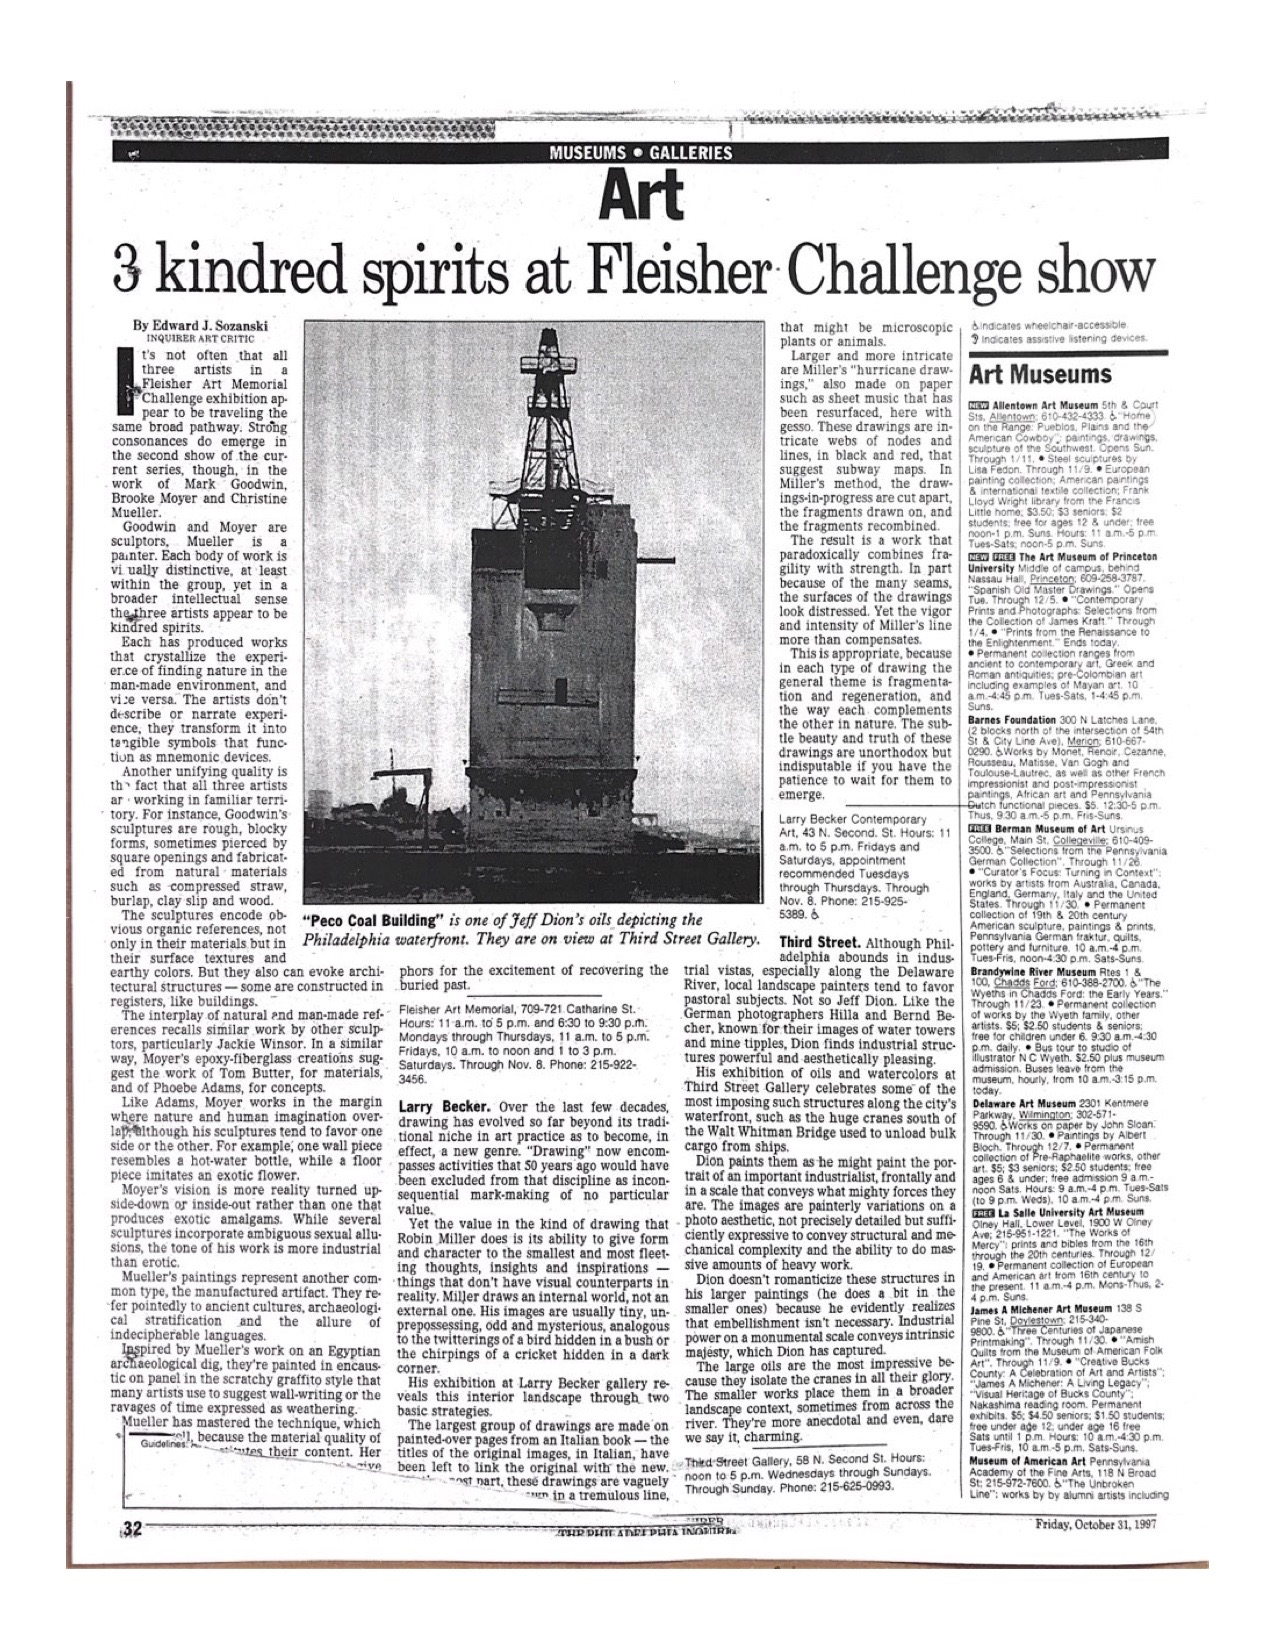 Jeff Dion - The Philadelphia Enquire Edward Sozanski 1997